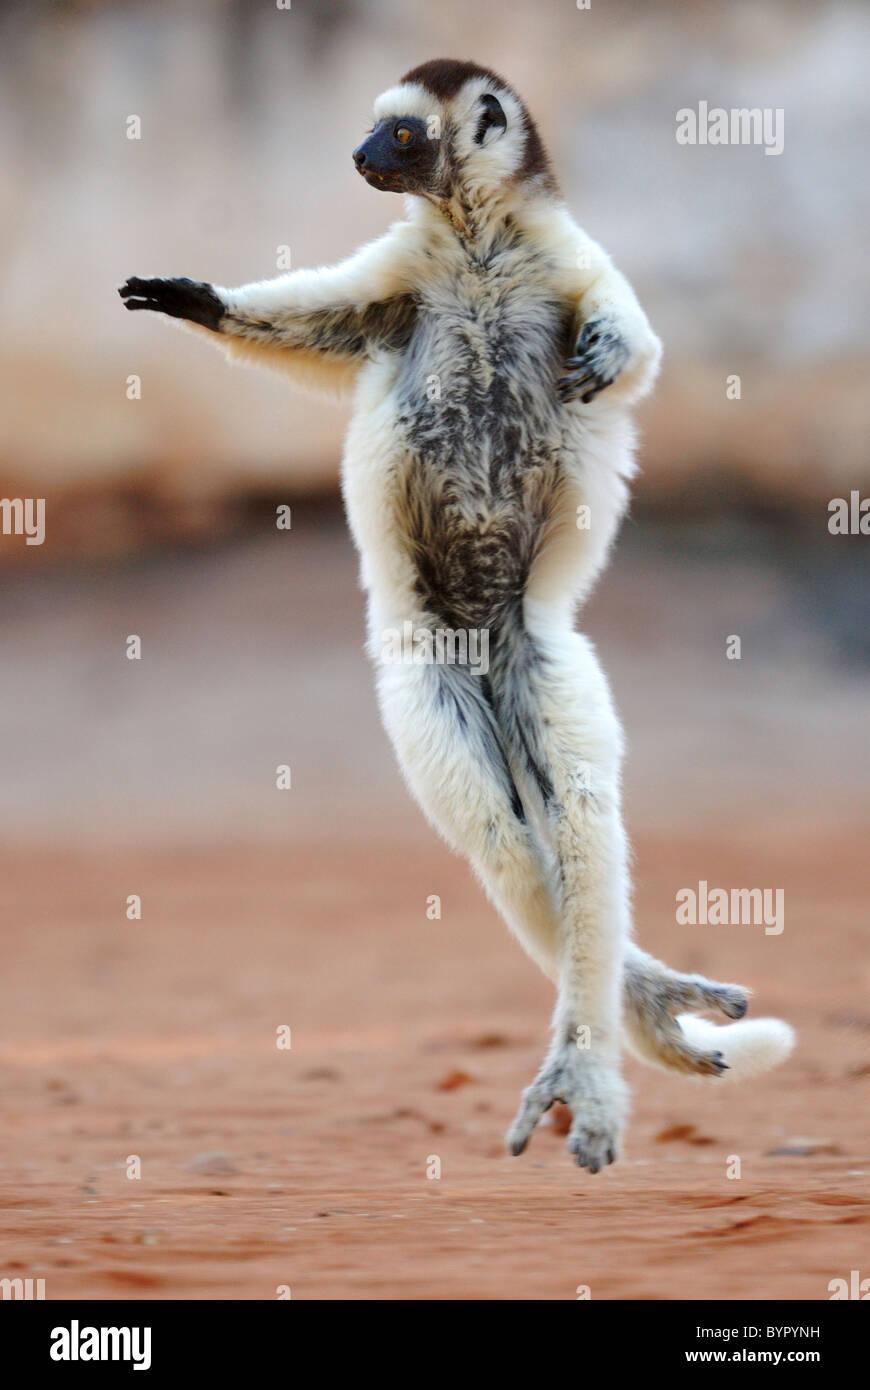 La Verreaux Sifaka (Propithecus verreauxi) dancing in Madagascar Immagini Stock